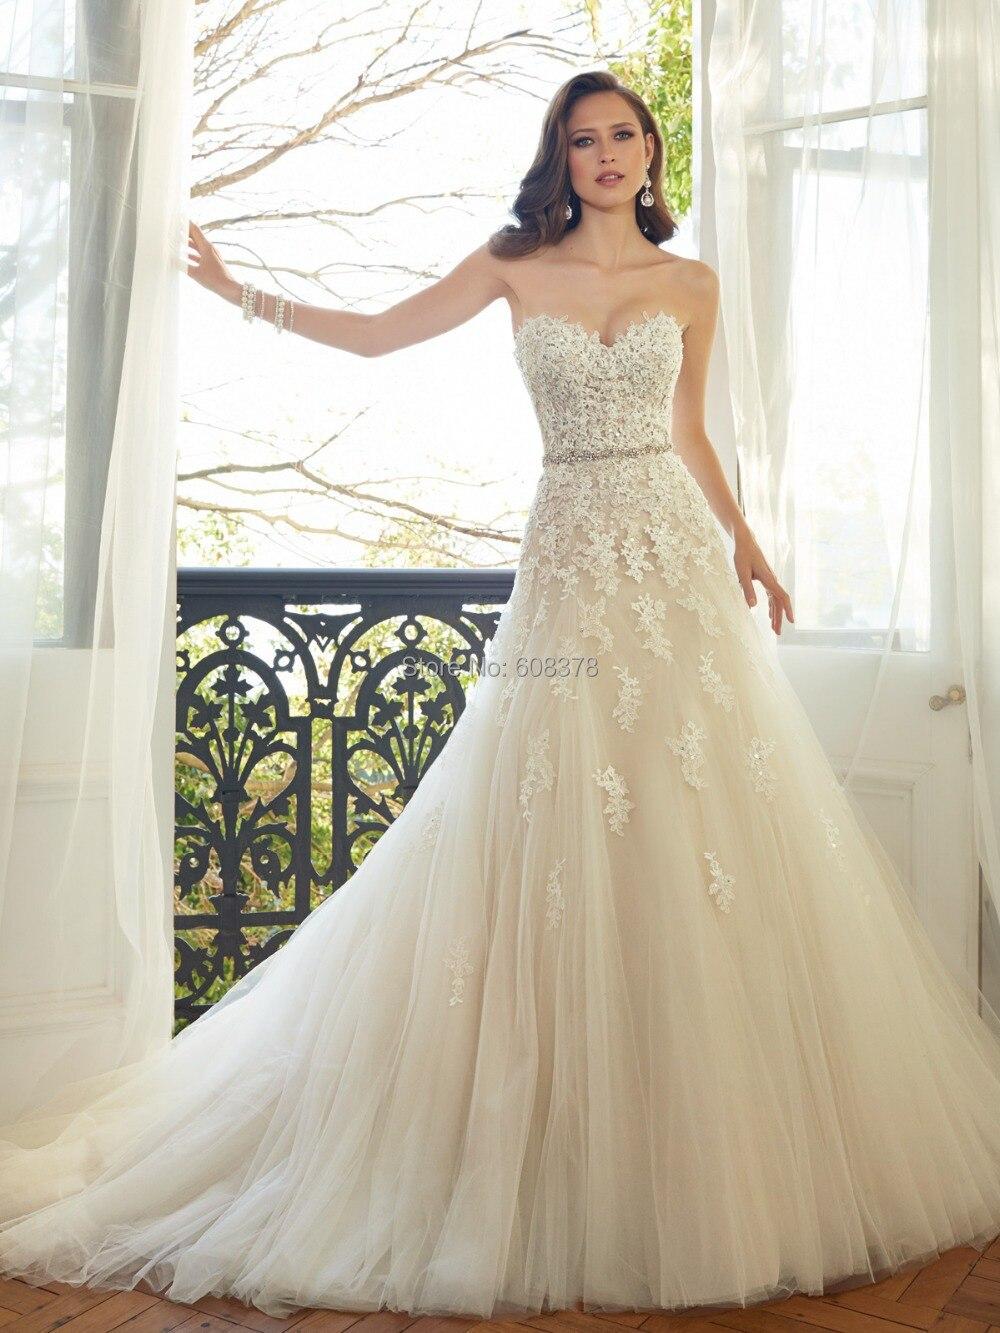 ivory chiffon lace vintage a line strapless sweetheart wedding dress lace vintage wedding dress ivory chiffon lace vintage sweetheart wedding dress